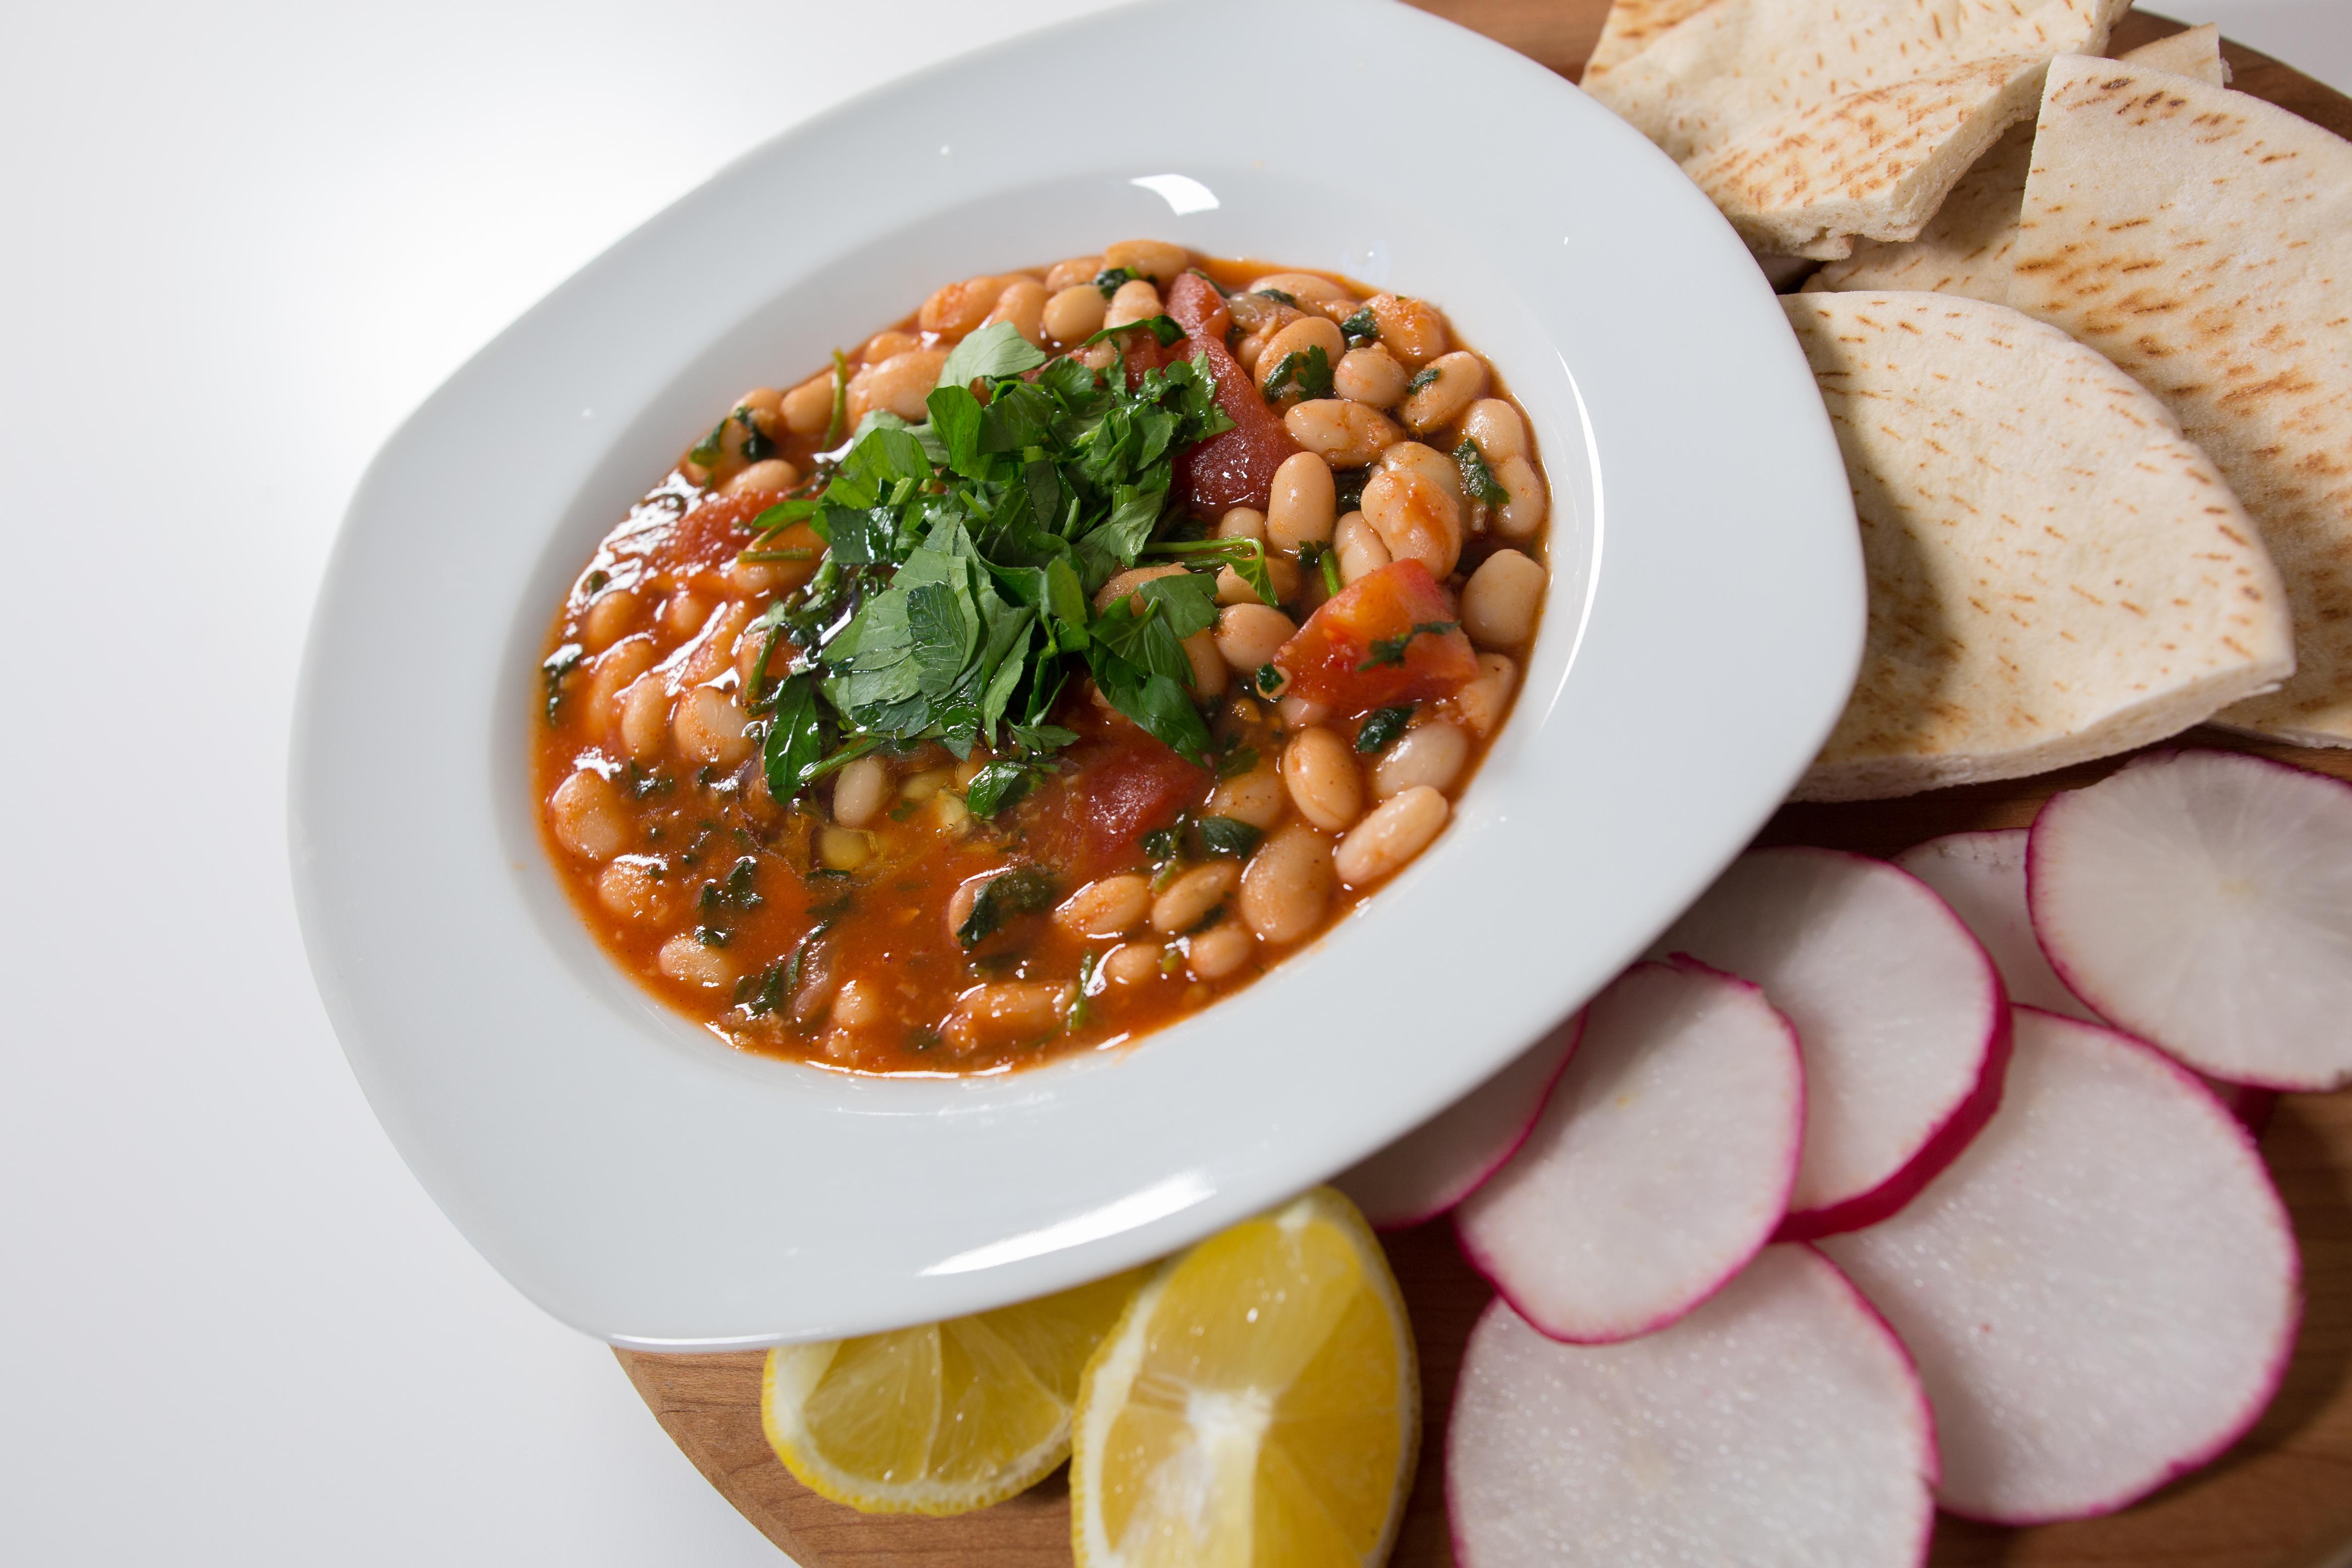 White Kidney beans, Fasulia Bzeyt